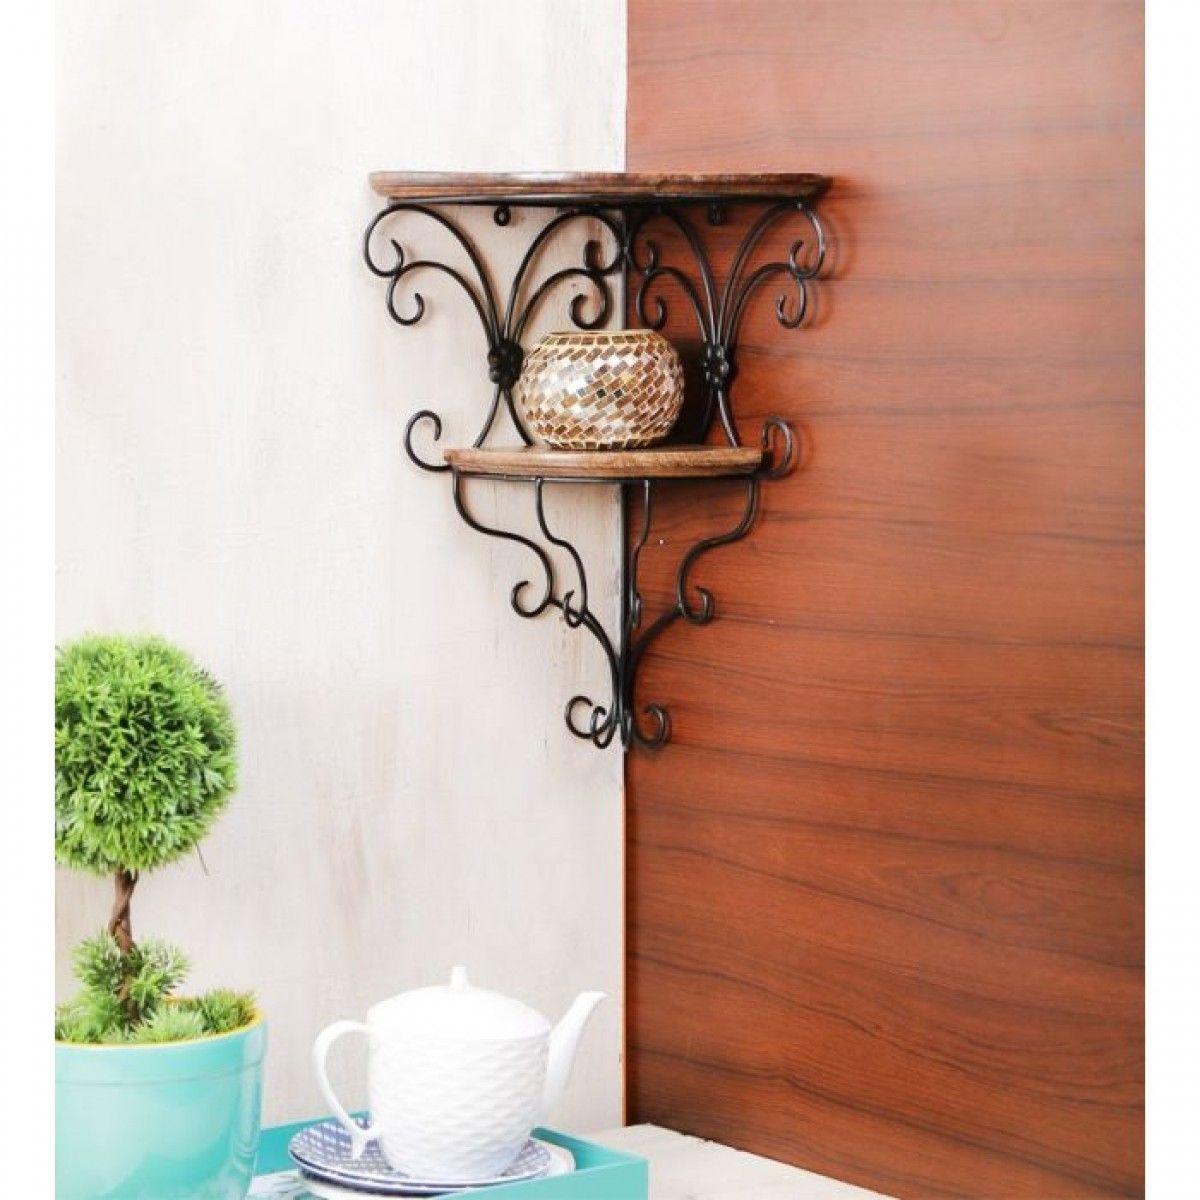 Hand carved shelf key hanger doorbell and